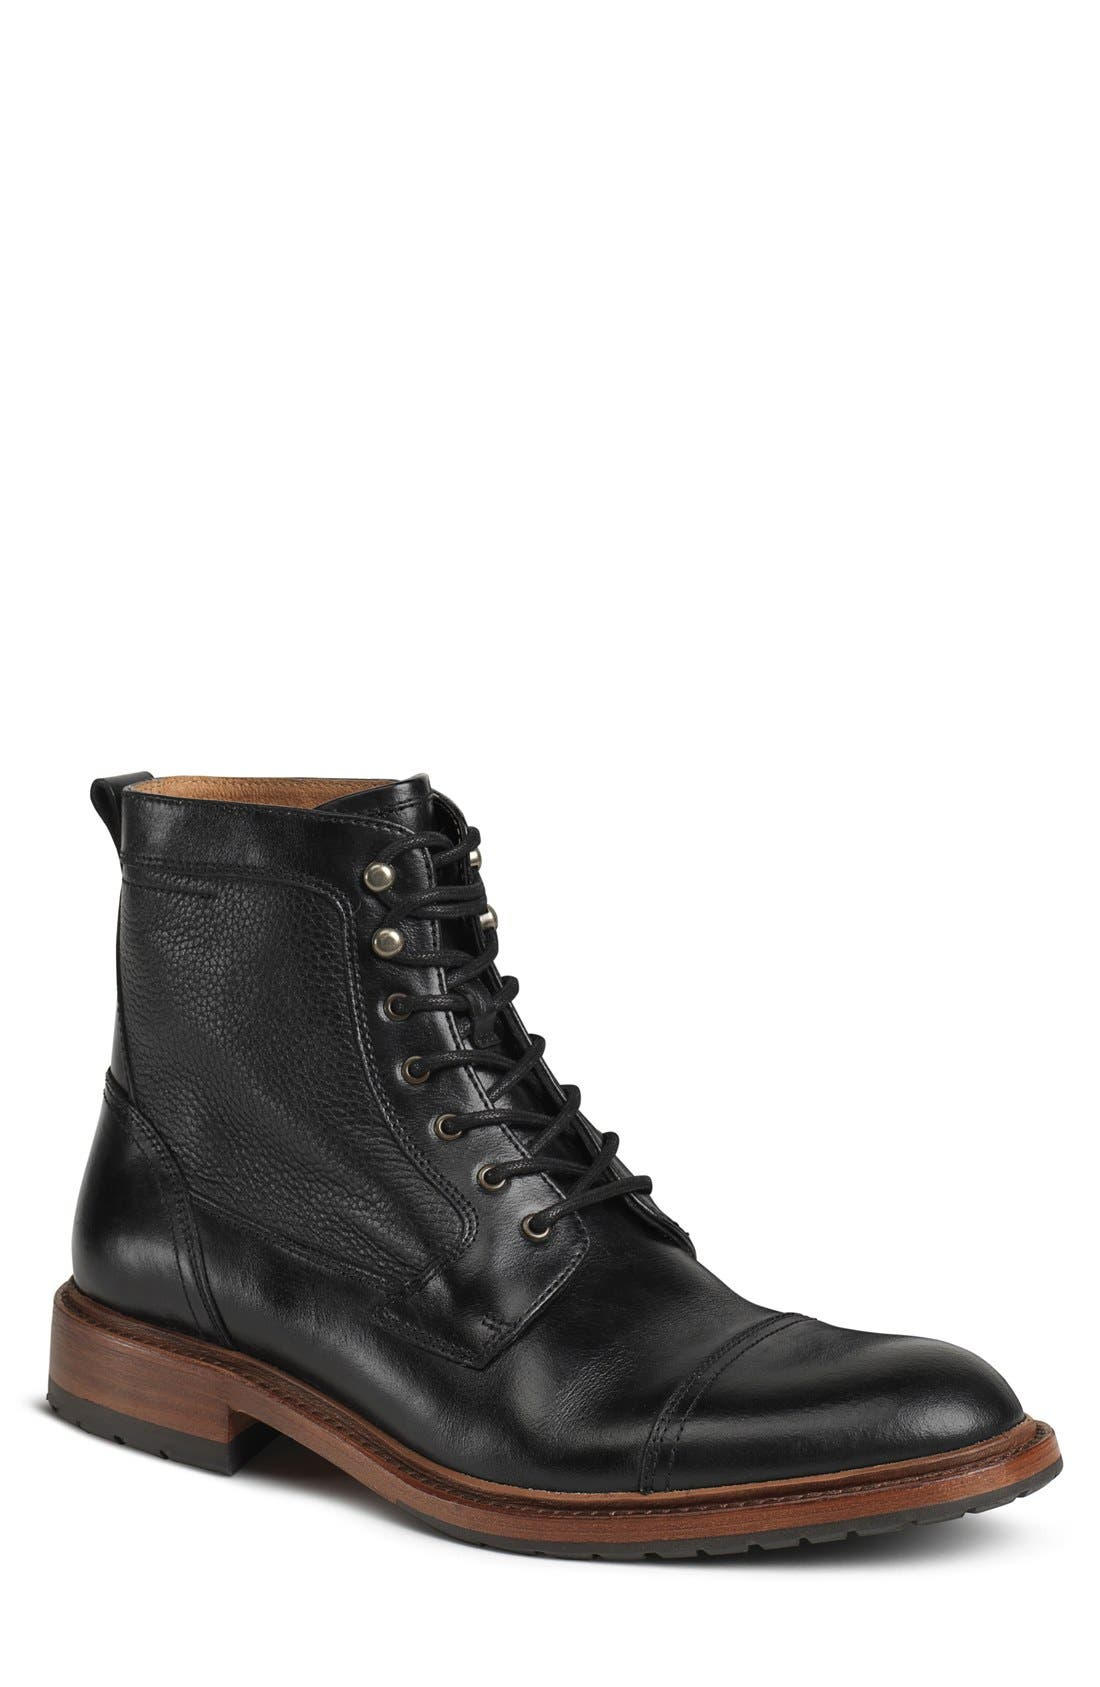 'Lowell' Cap Toe Boot,                             Main thumbnail 1, color,                             BLACK